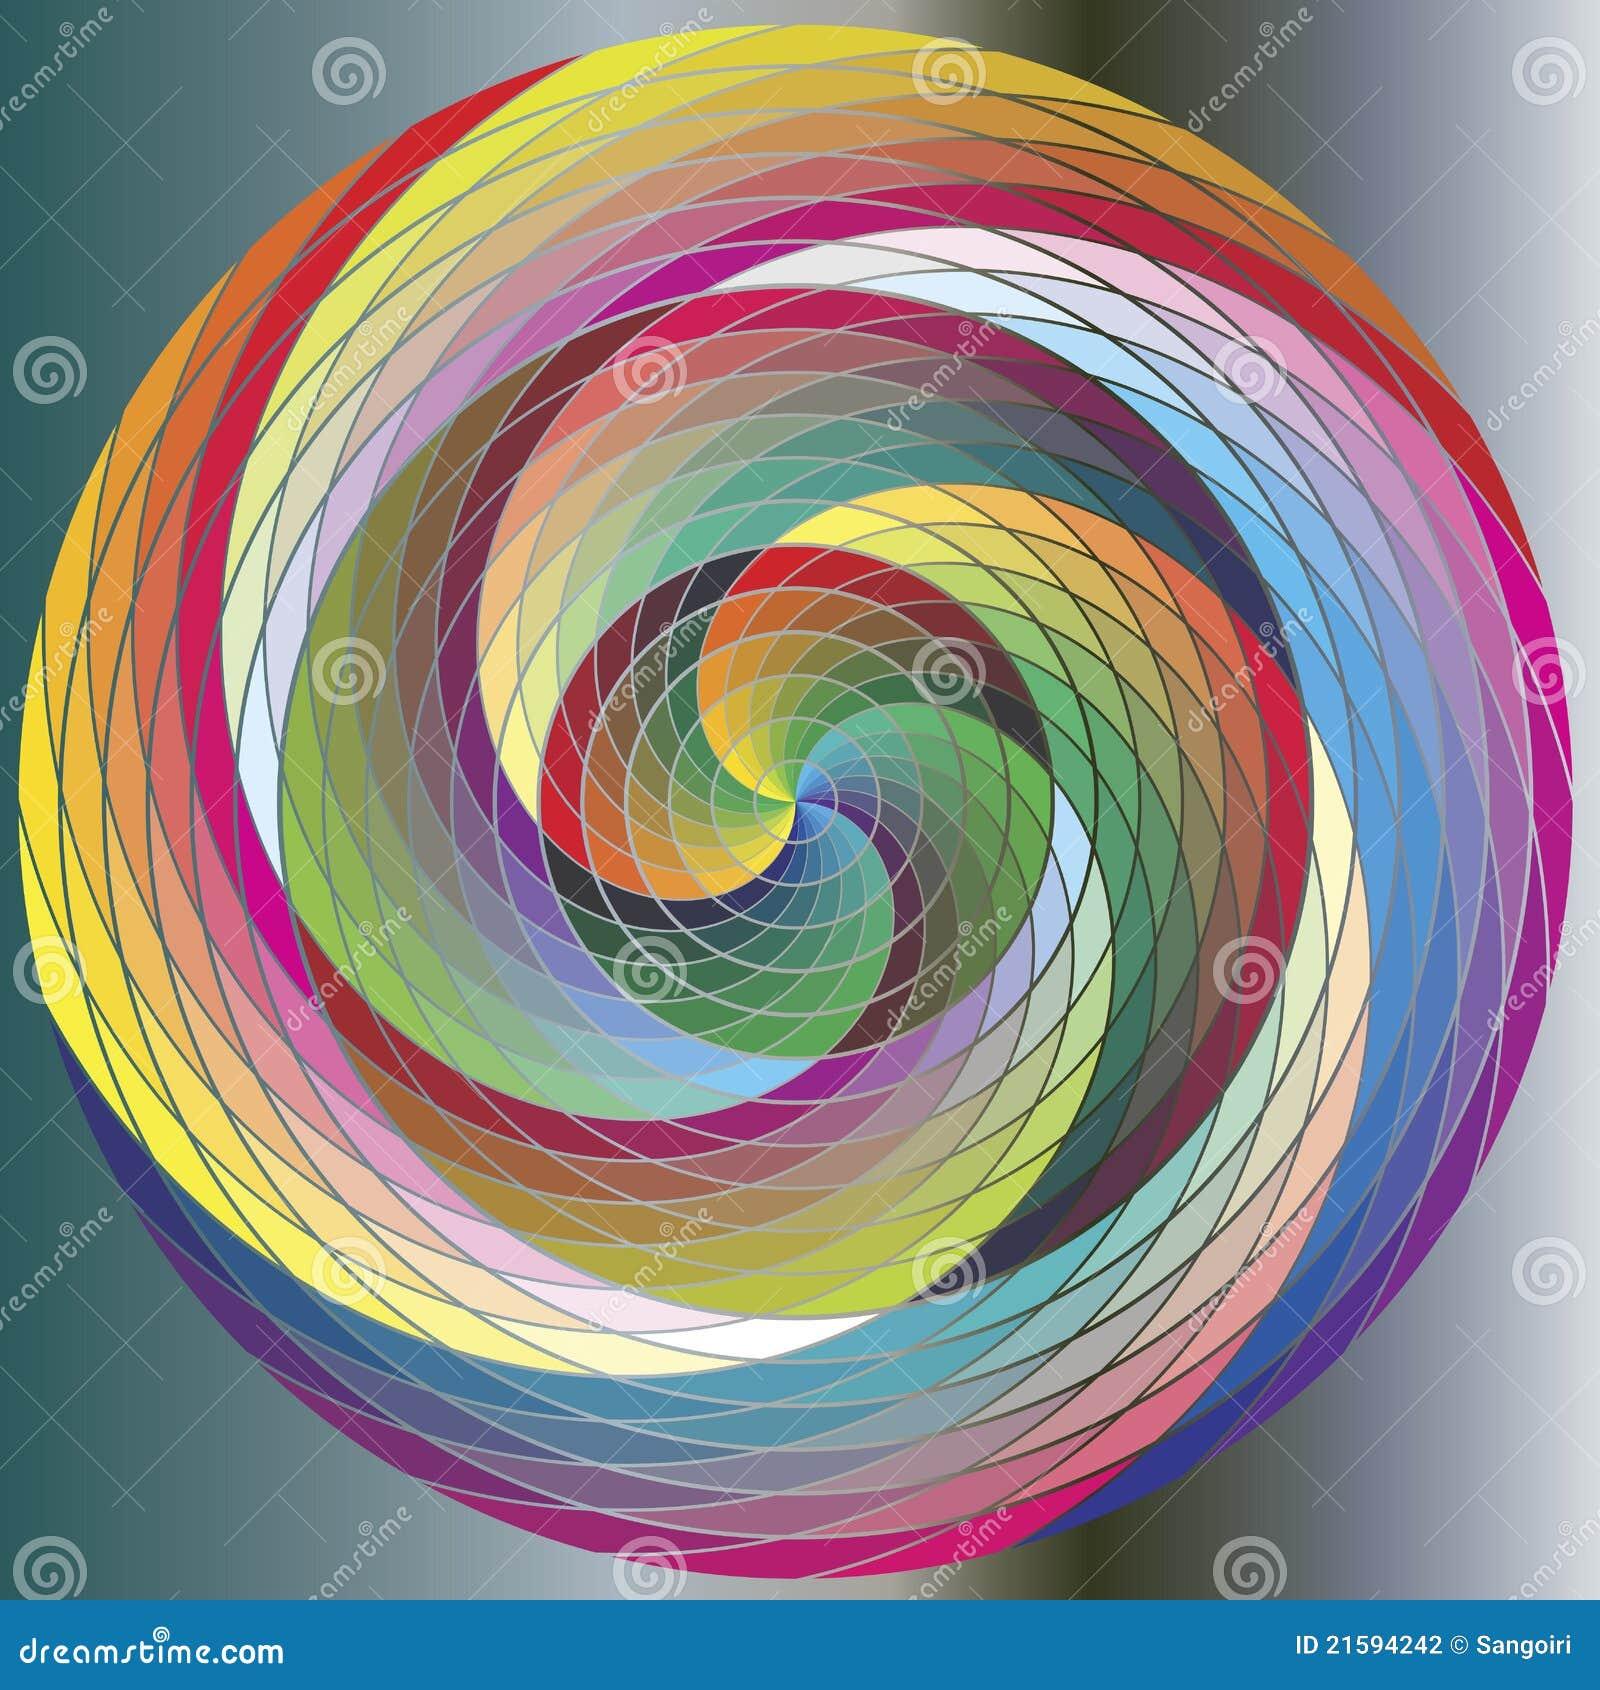 Quarter Of A Circle Clipart Multicolored Ra...